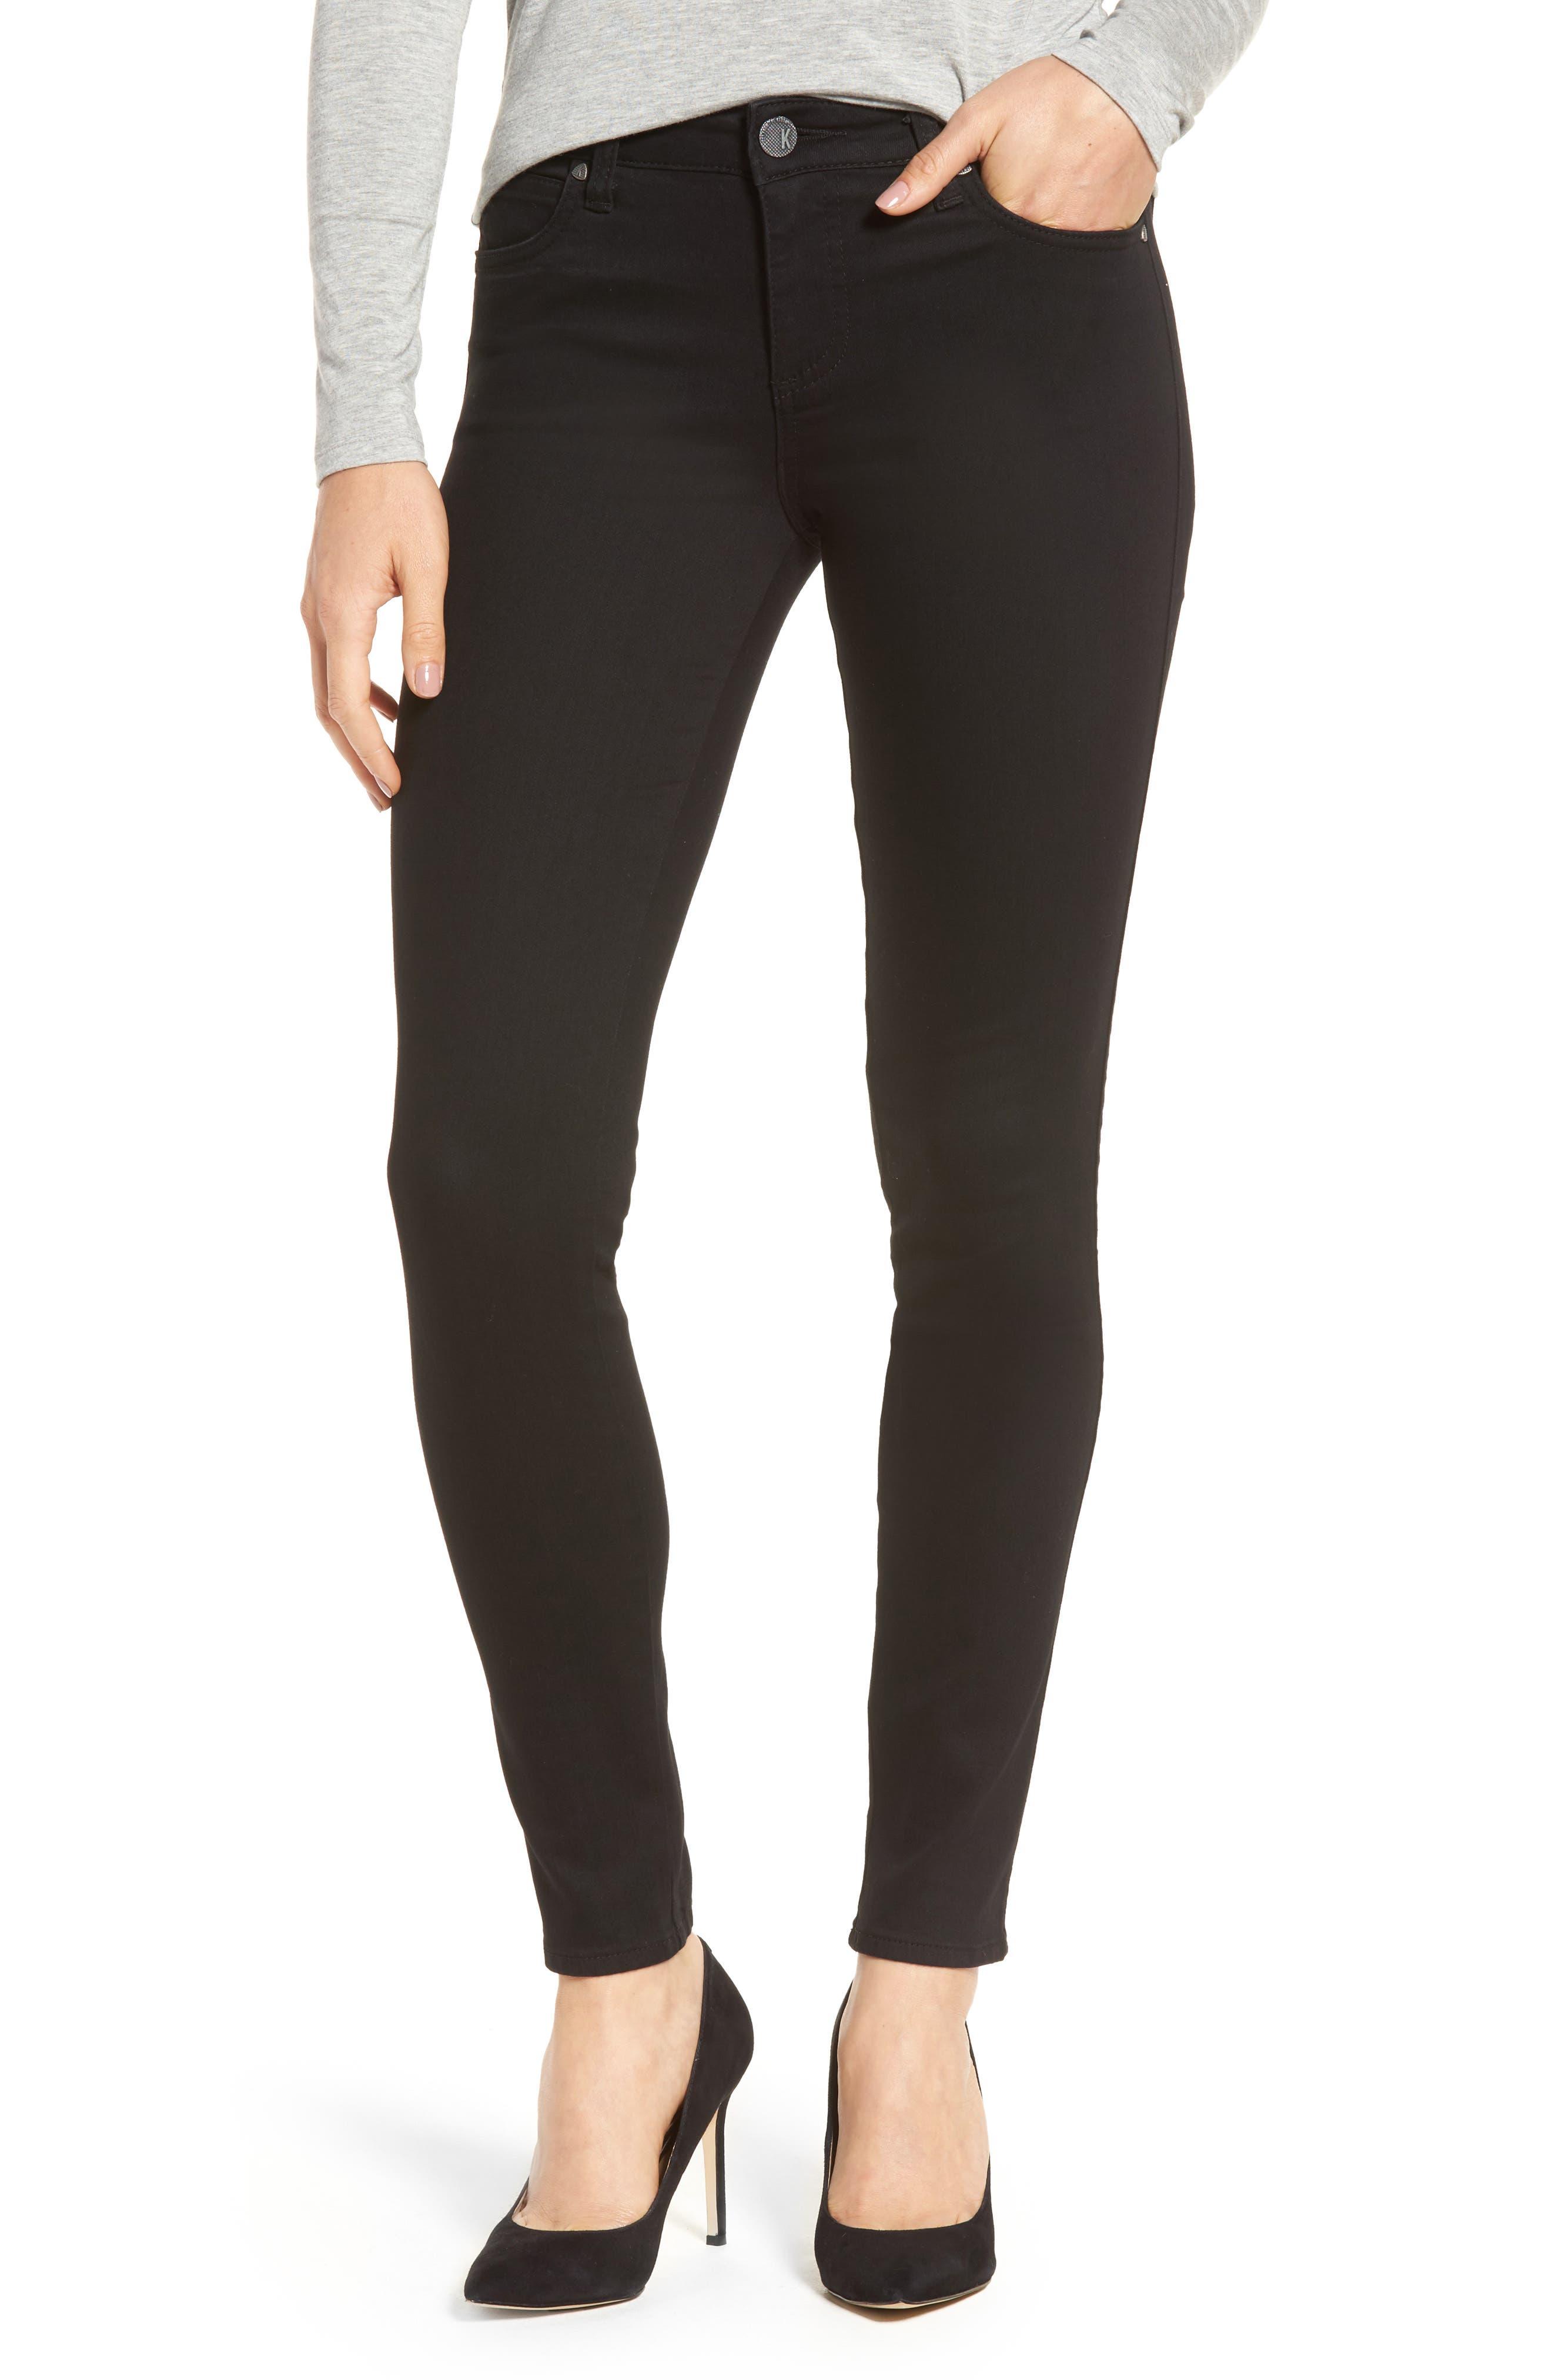 Diana Curvy Fit Skinny Jeans,                             Main thumbnail 1, color,                             Black